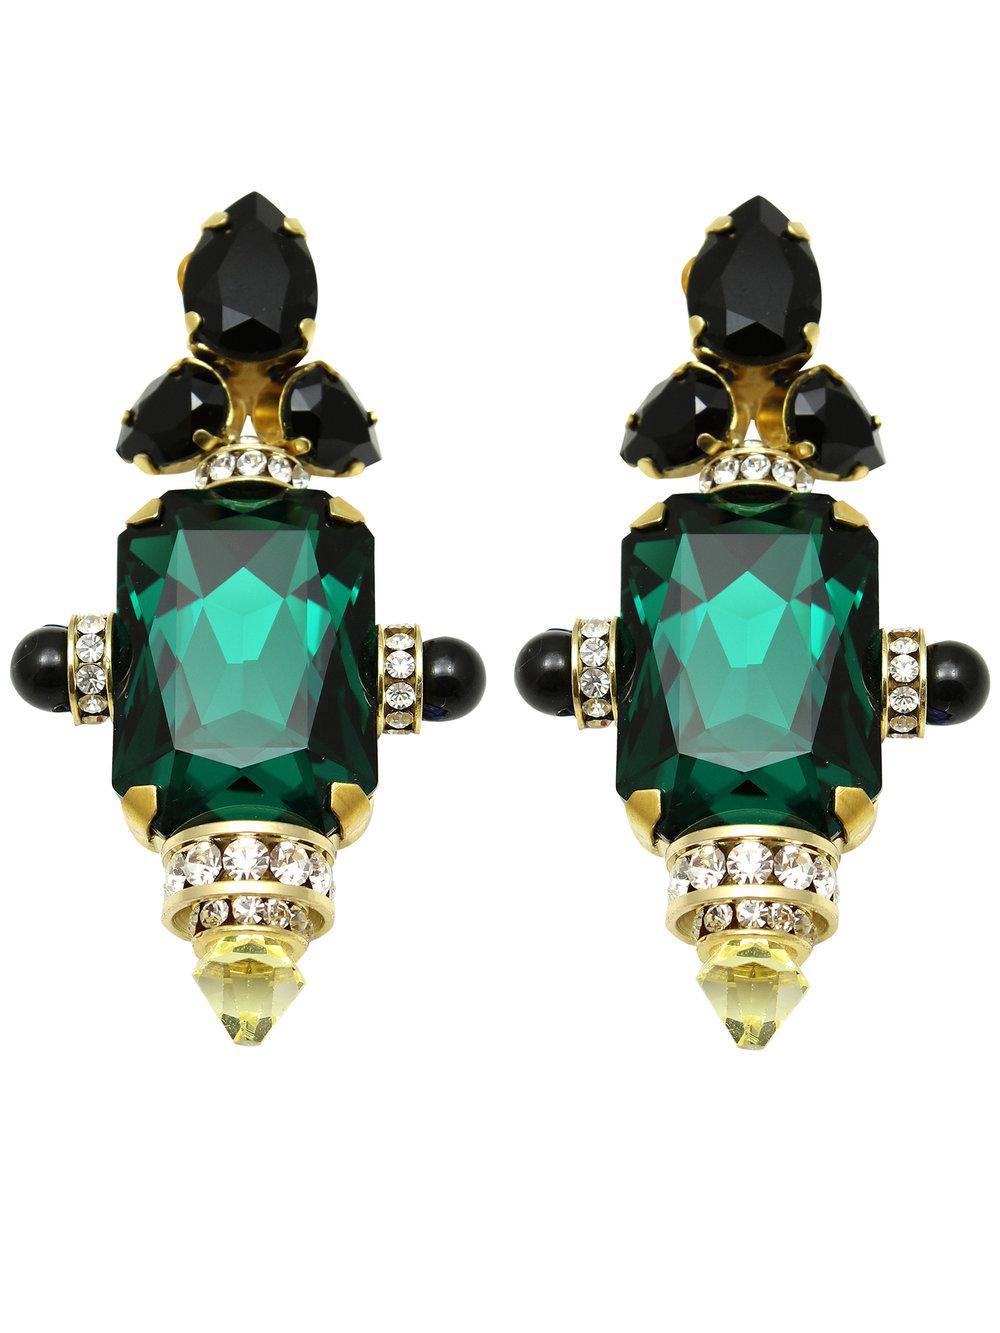 182E-GB Moscow Earrings - Green_Black.jpg